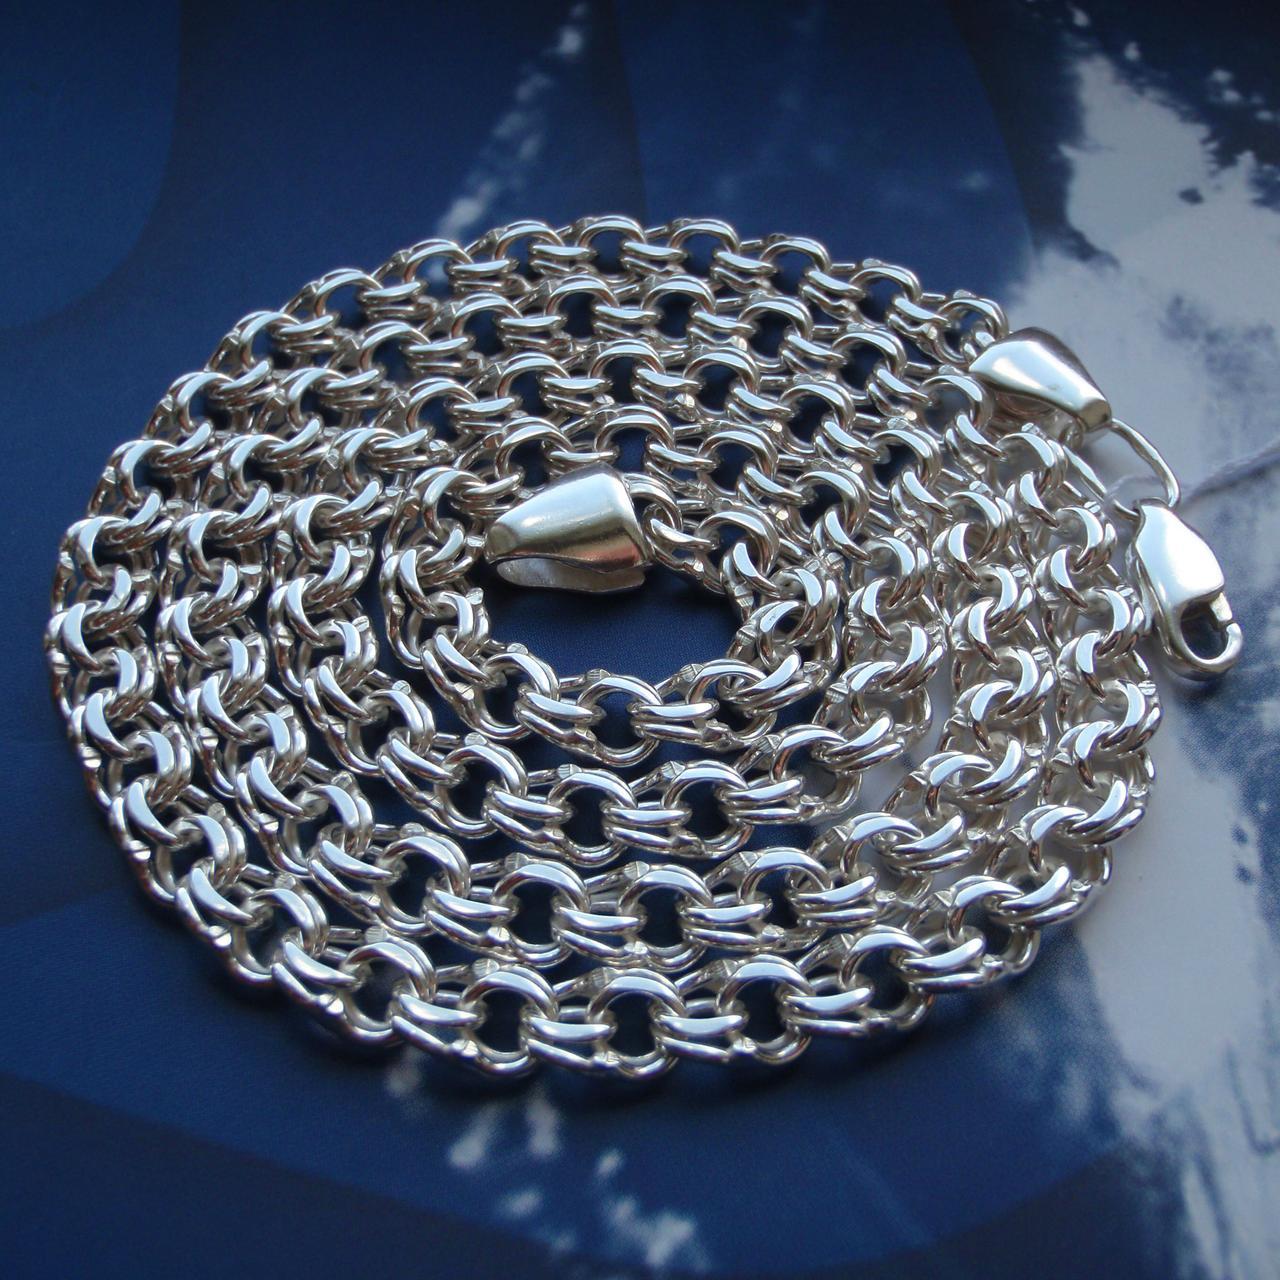 Серебряная цепочка, 550мм, 26 грамм, плетение Бисмарк